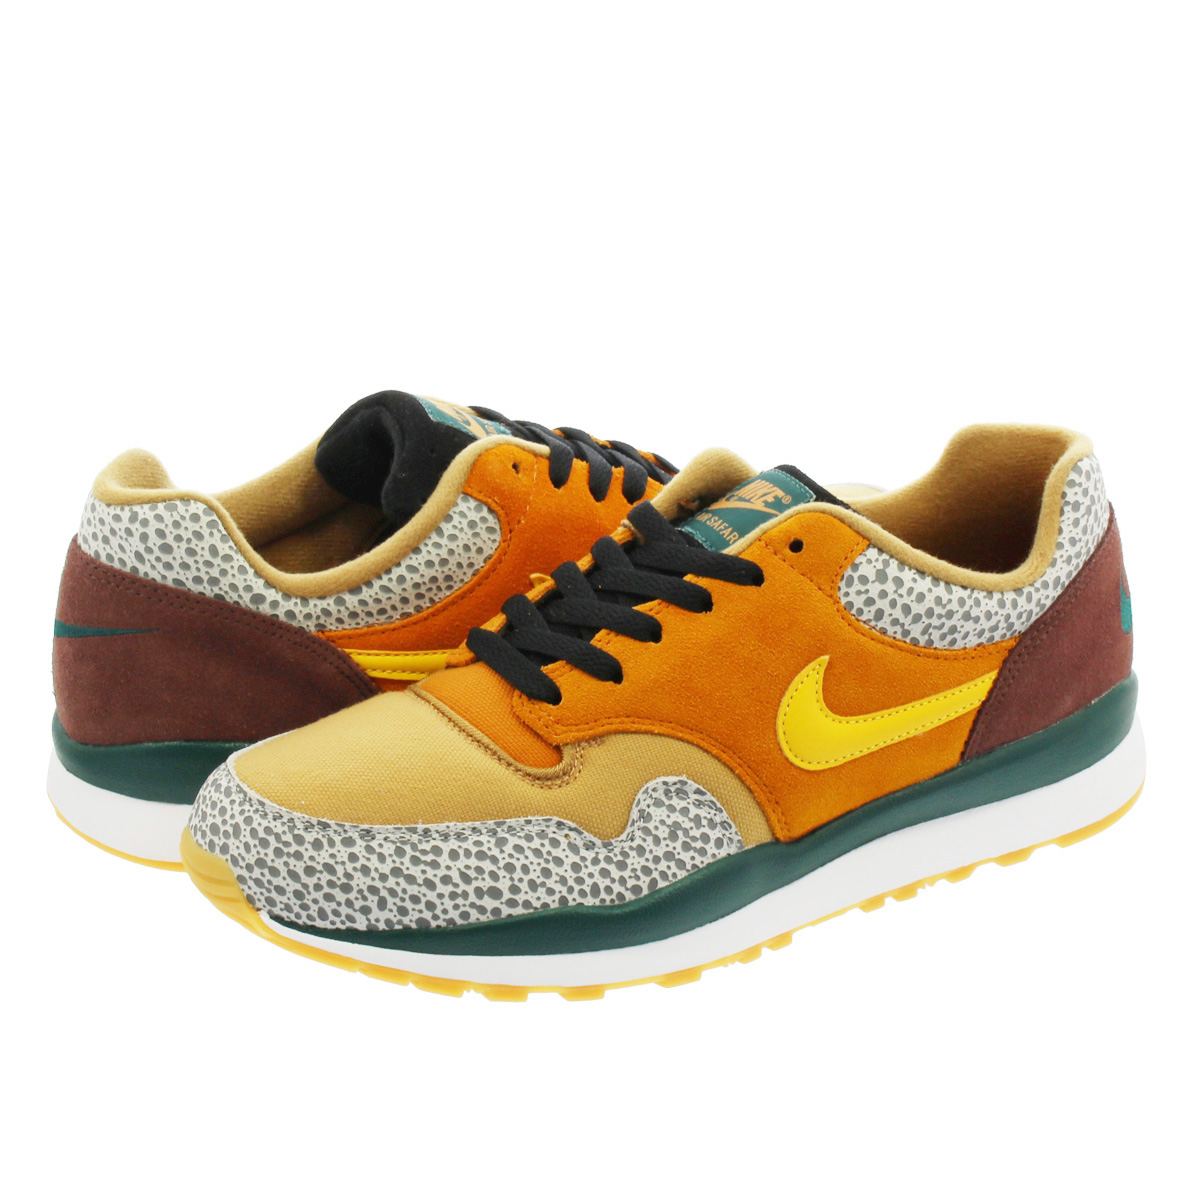 NIKE AIR SAFARI SE Nike air safari SE MONARCH FLAX MAHOGANY MINK YELLOW  OCHRE ao3298-800 57198d70c